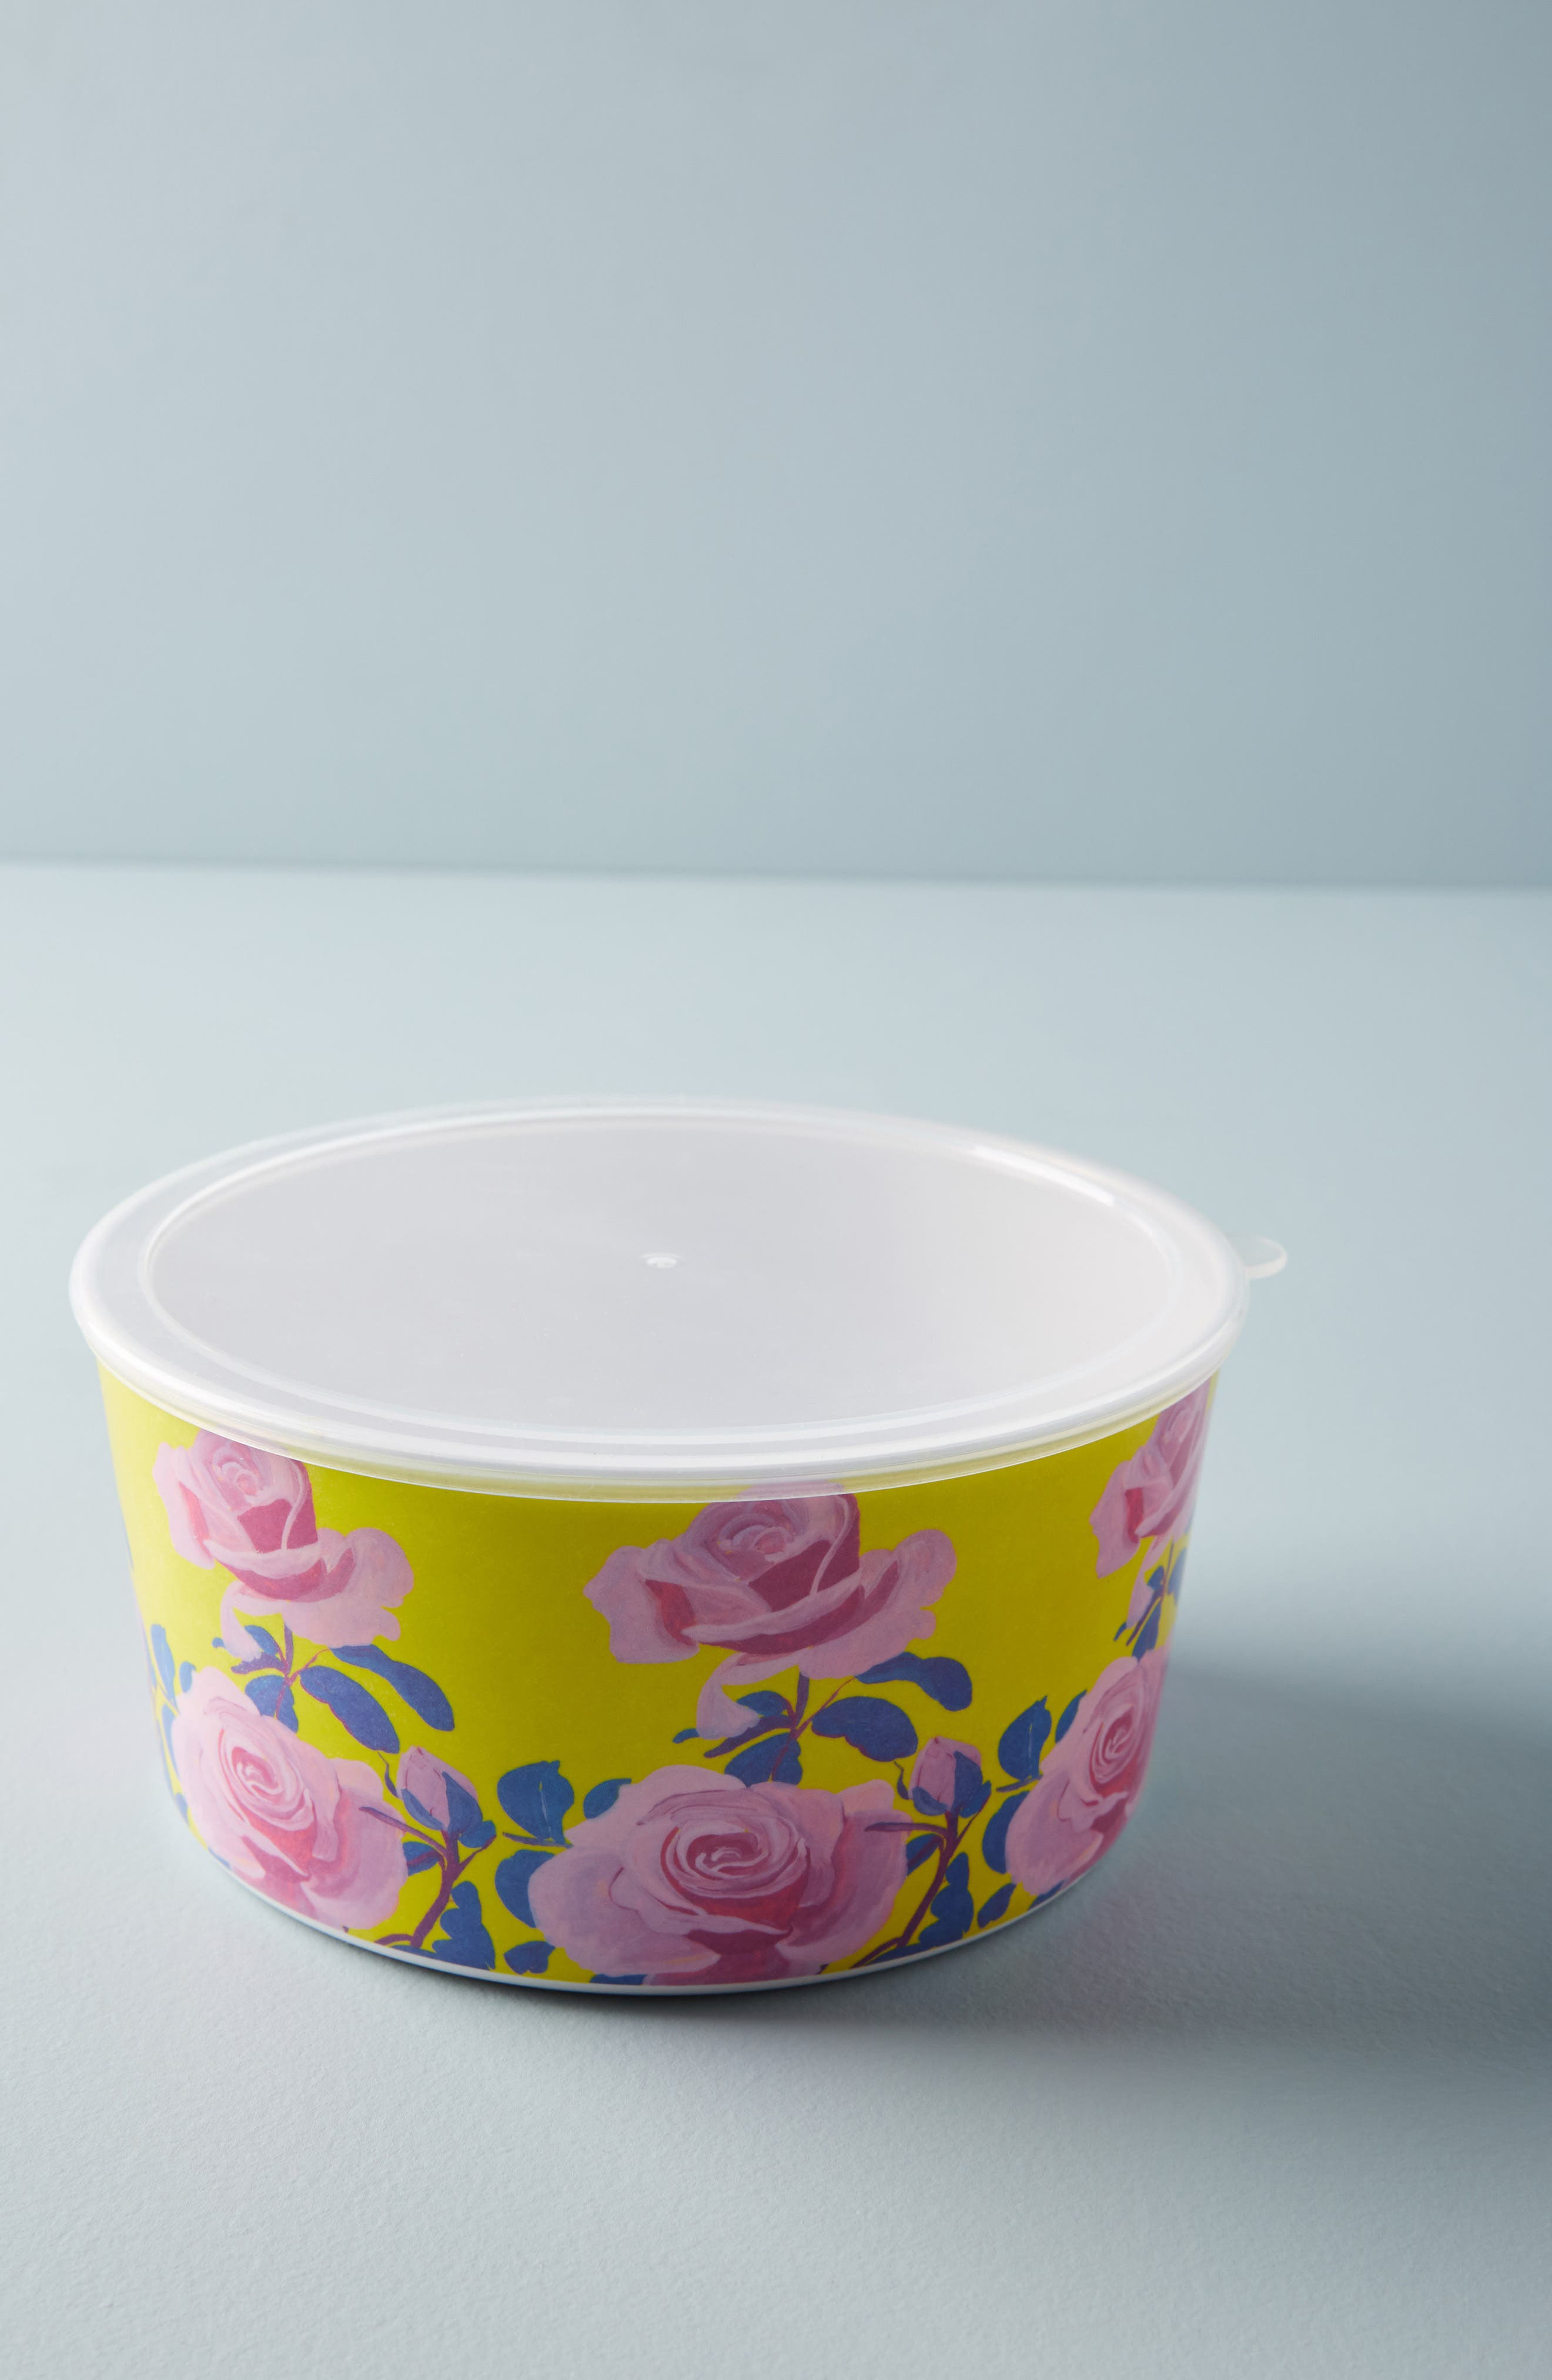 Anthropologie Paint + Petals Melamine Storage Bowl